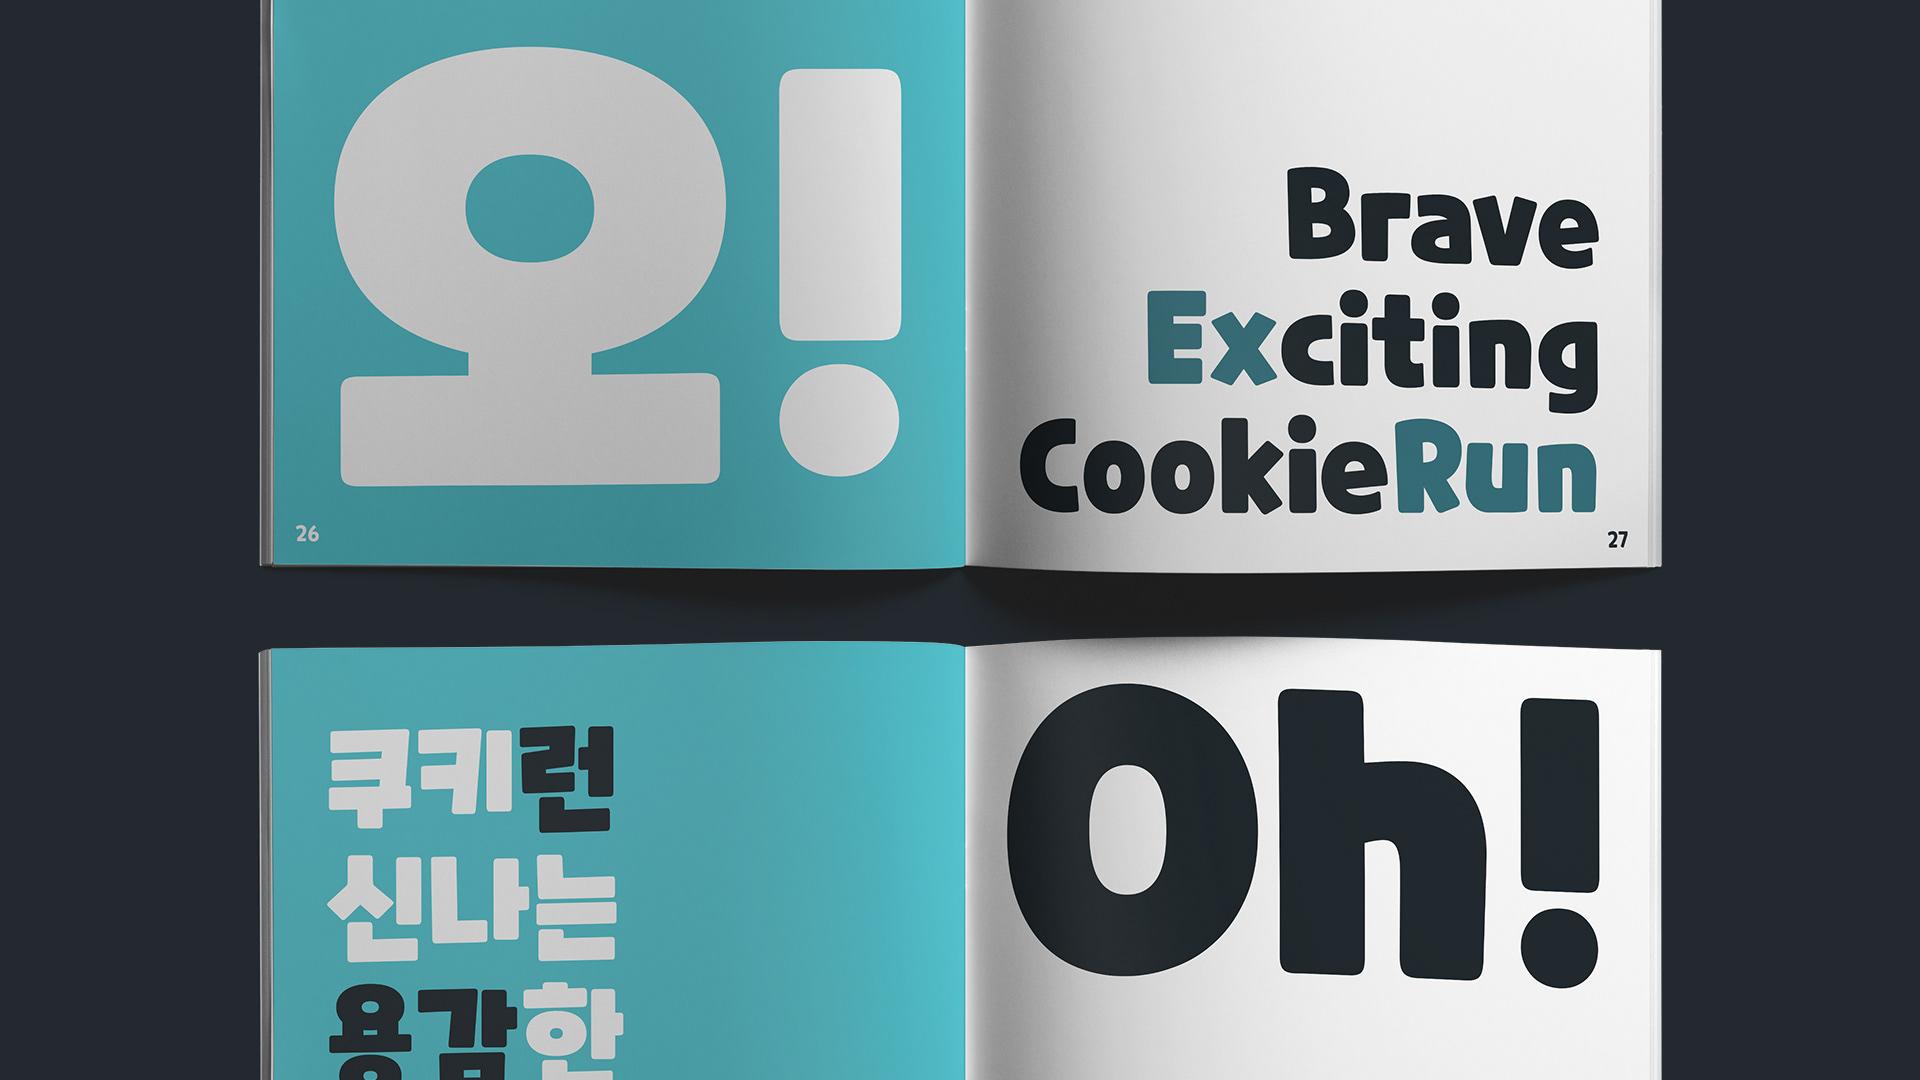 CookieRun Free Font - slab-serif